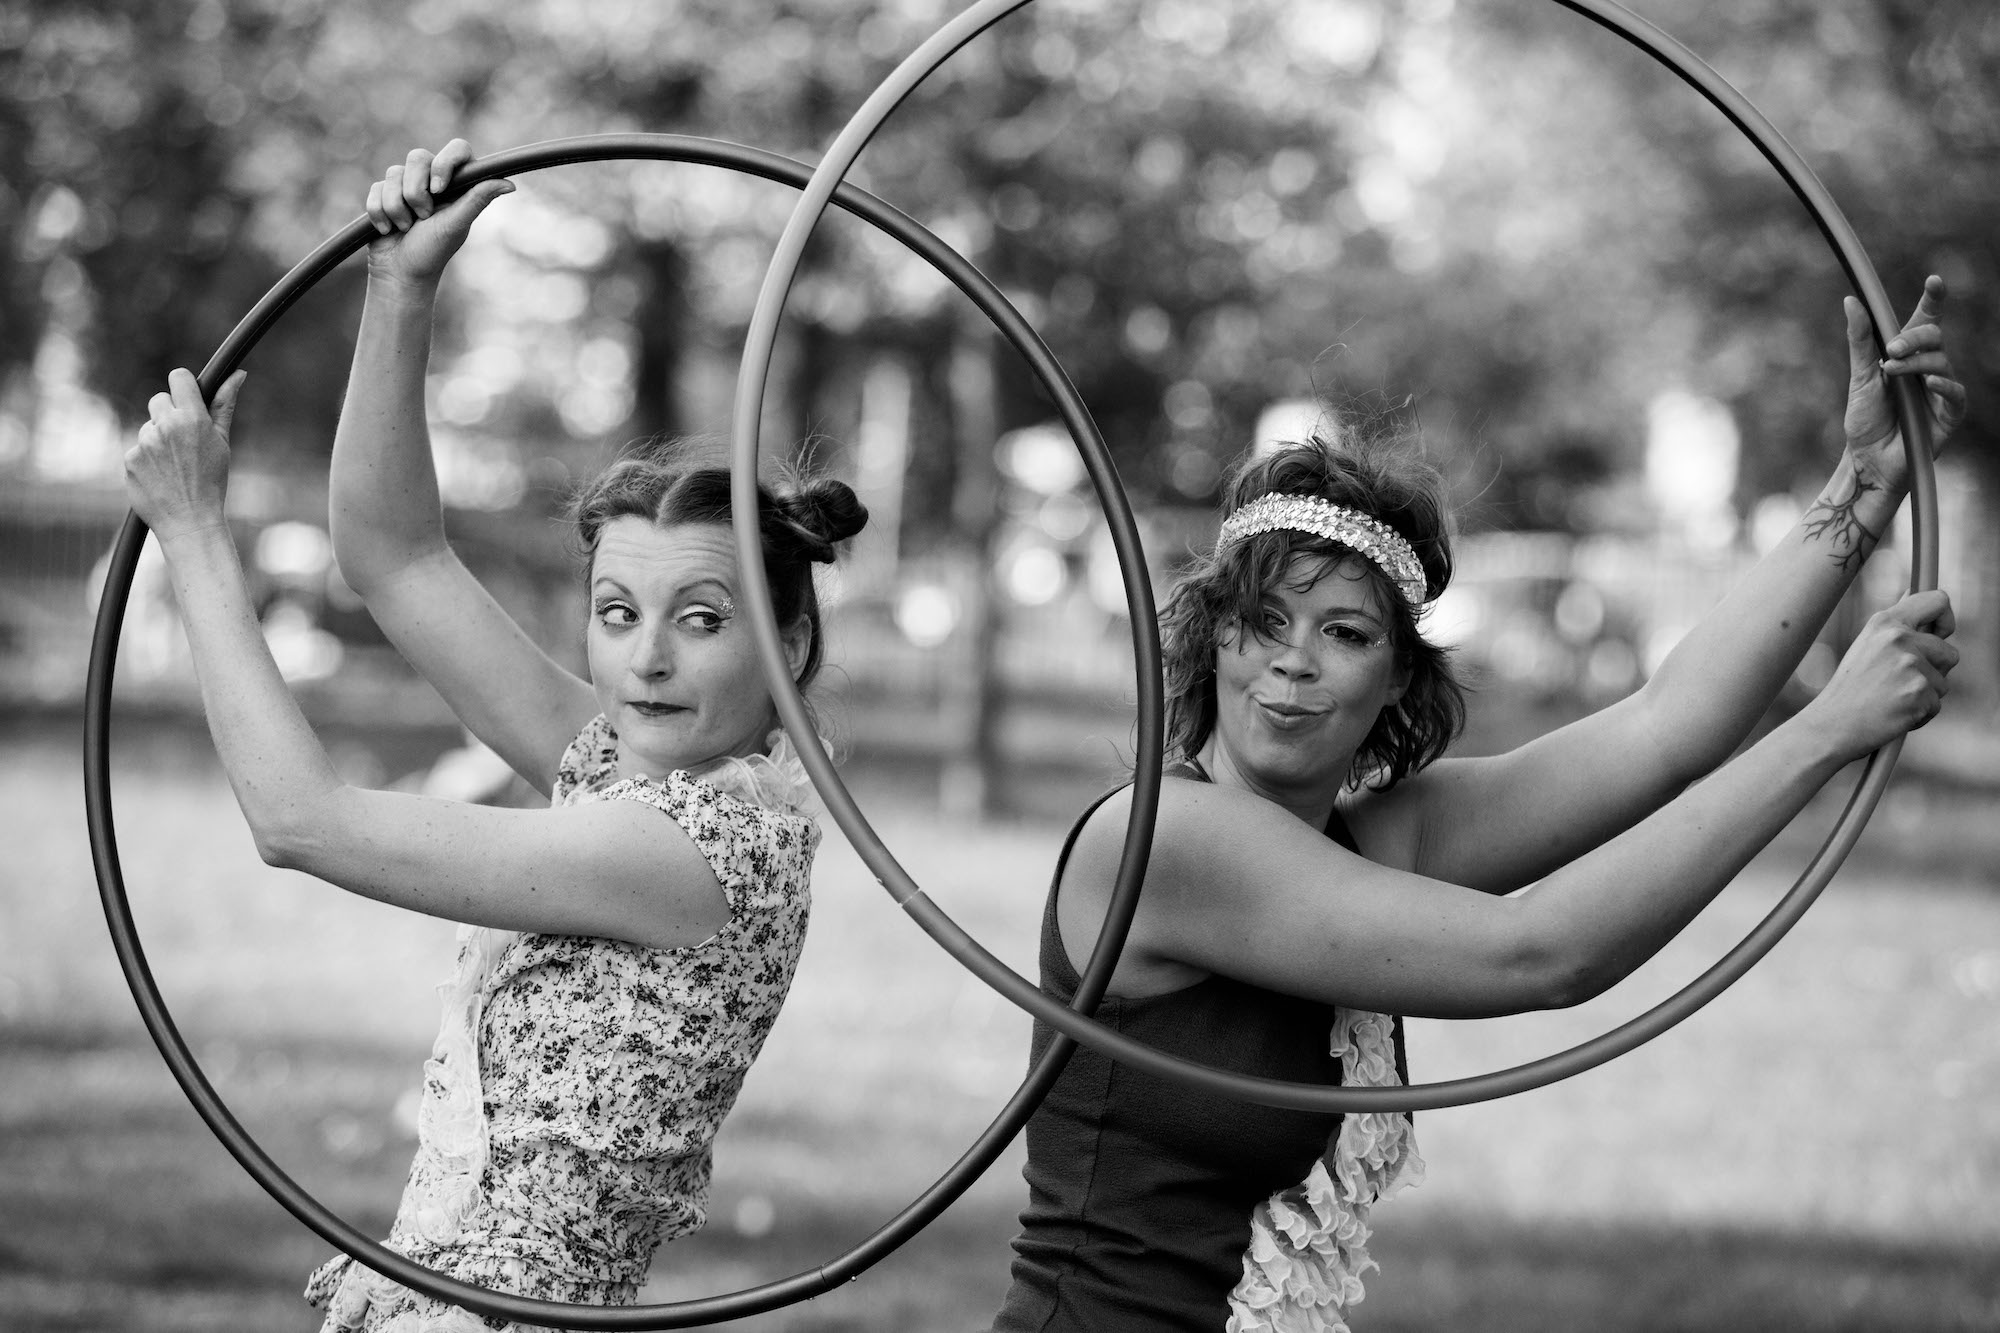 Sally & Kelly - Hula Hoop Performance